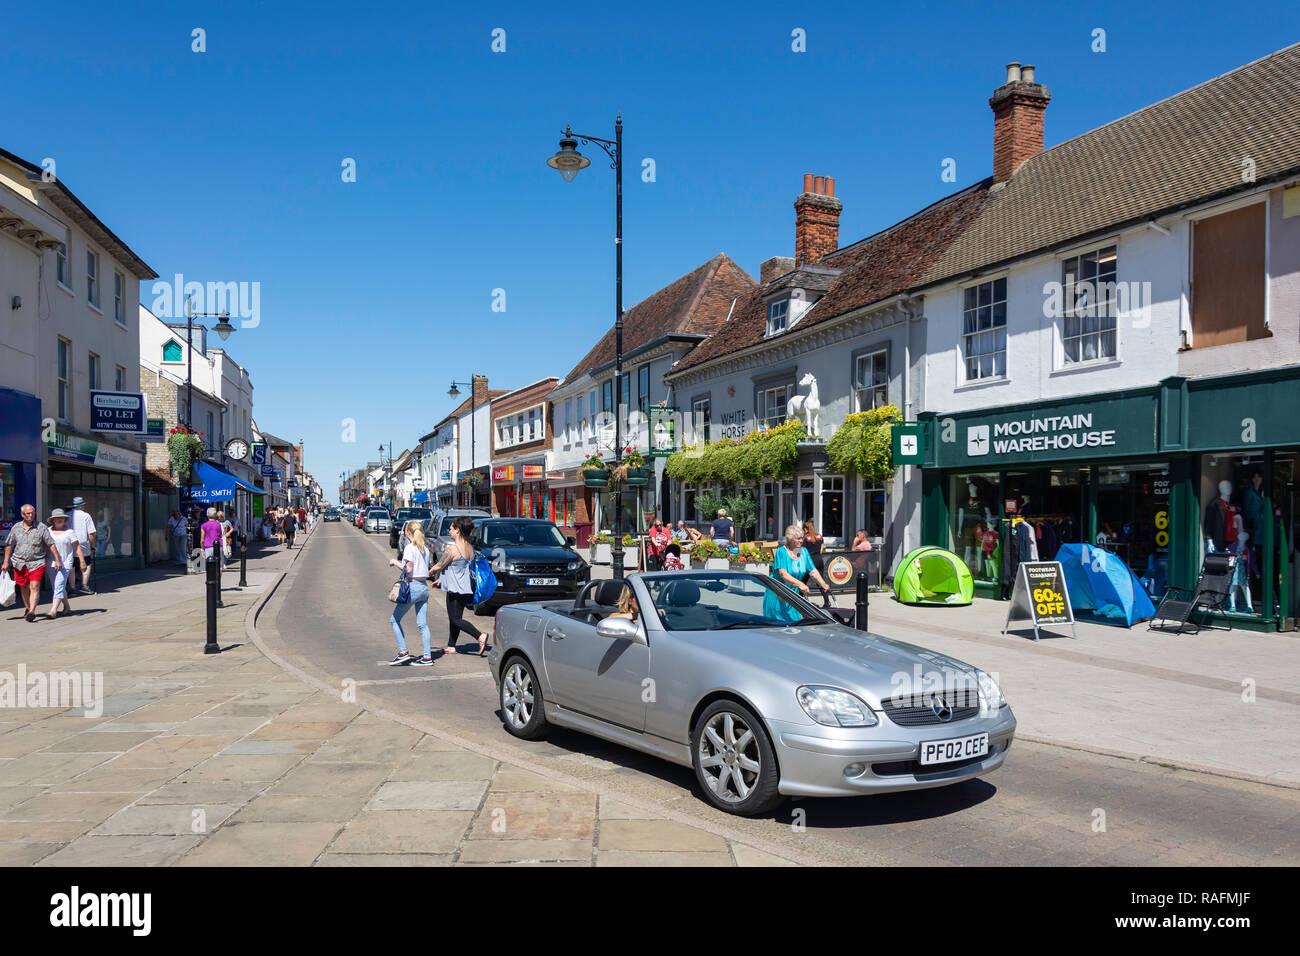 North Street, Sudbury, Suffolk, England, United Kingdom - Stock Image